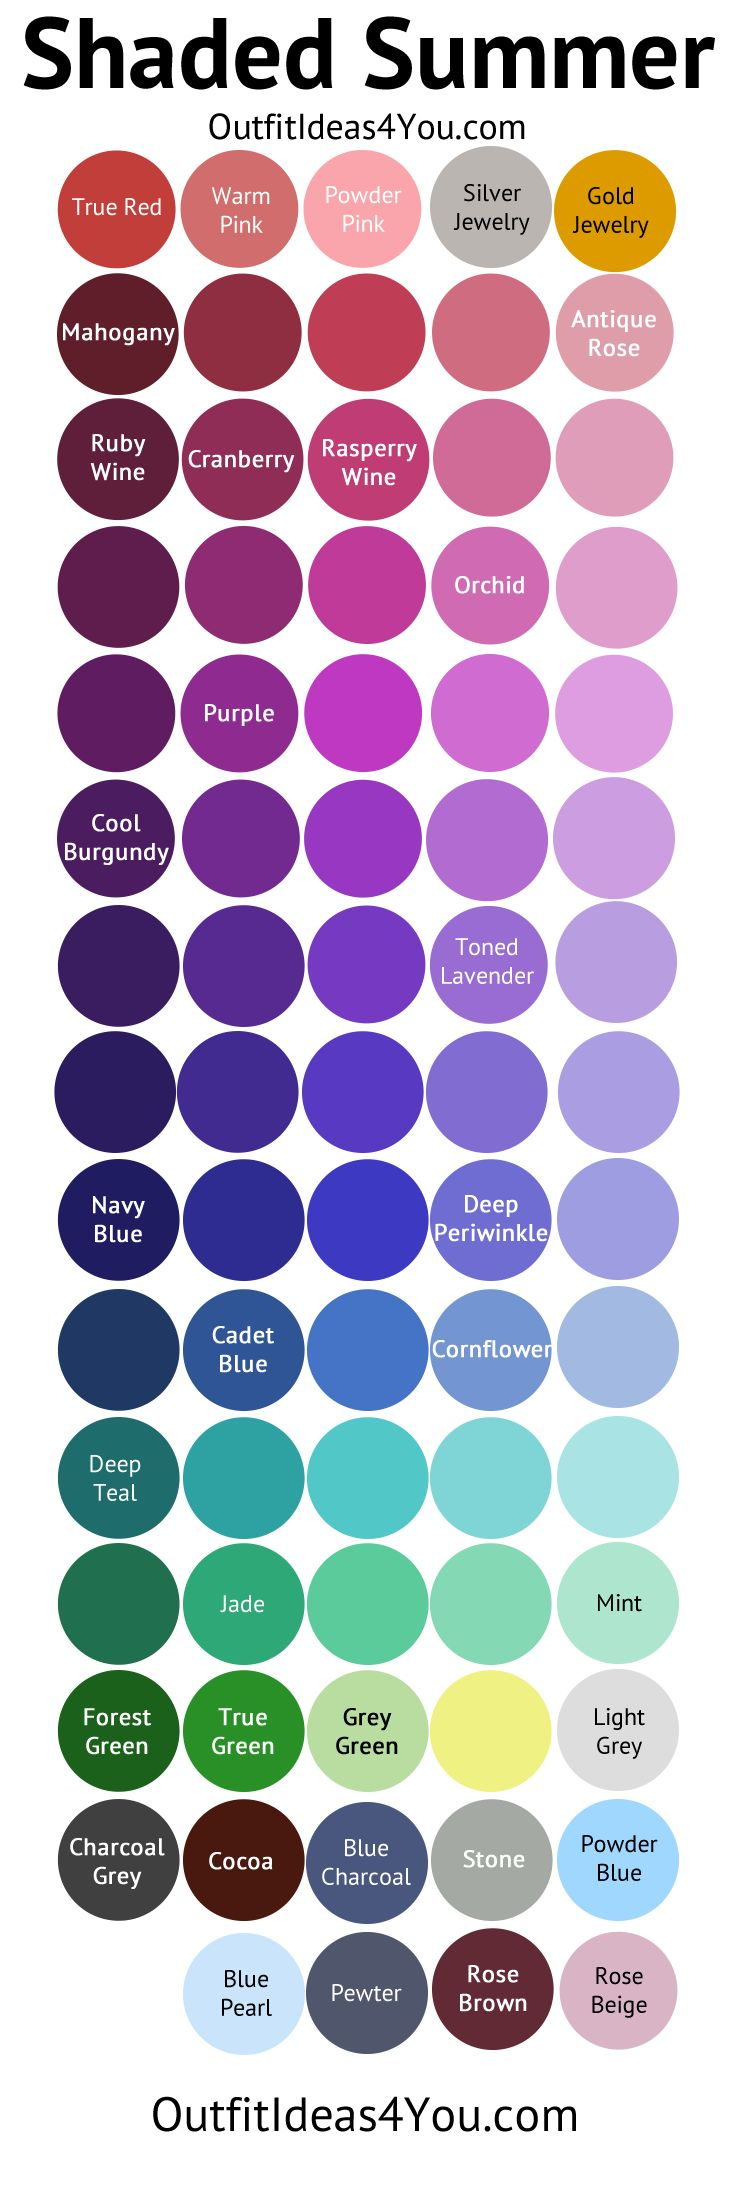 Summer Palette 2018: 17 Best Ideas About Summer Color Palettes On Pinterest